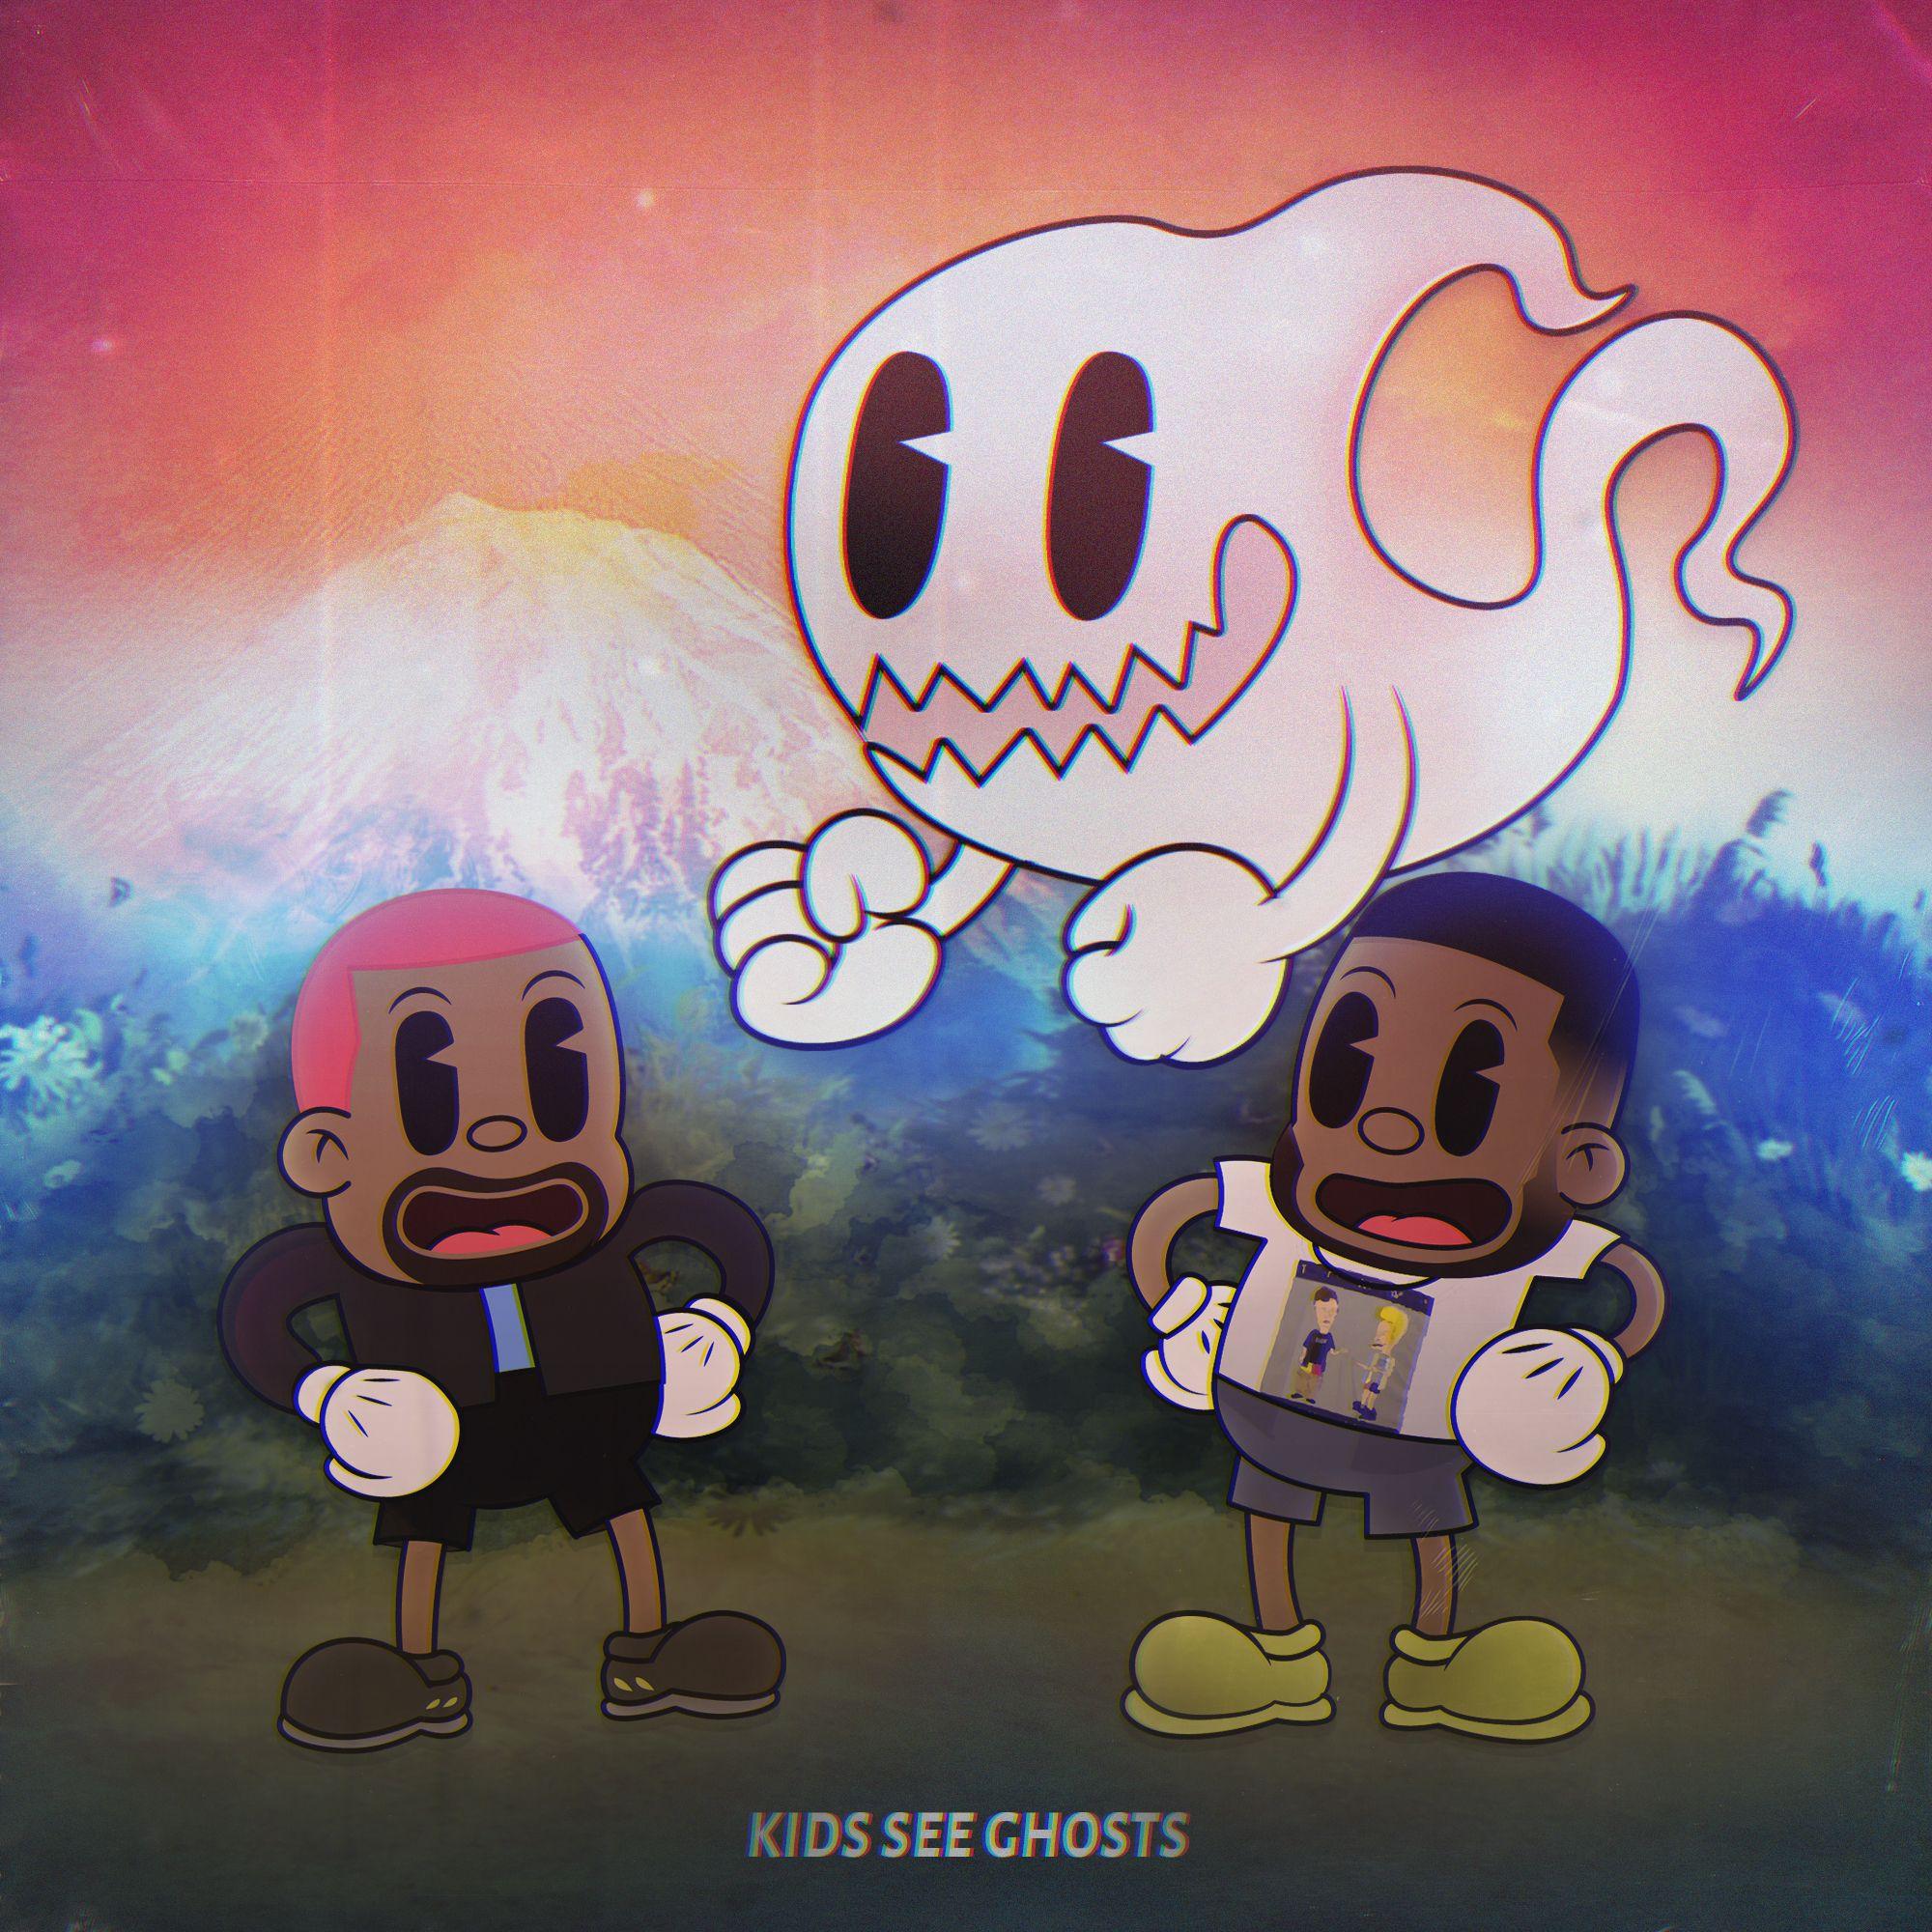 Kanye West and Kid cudi's kids see ghosts as a cartoon ...